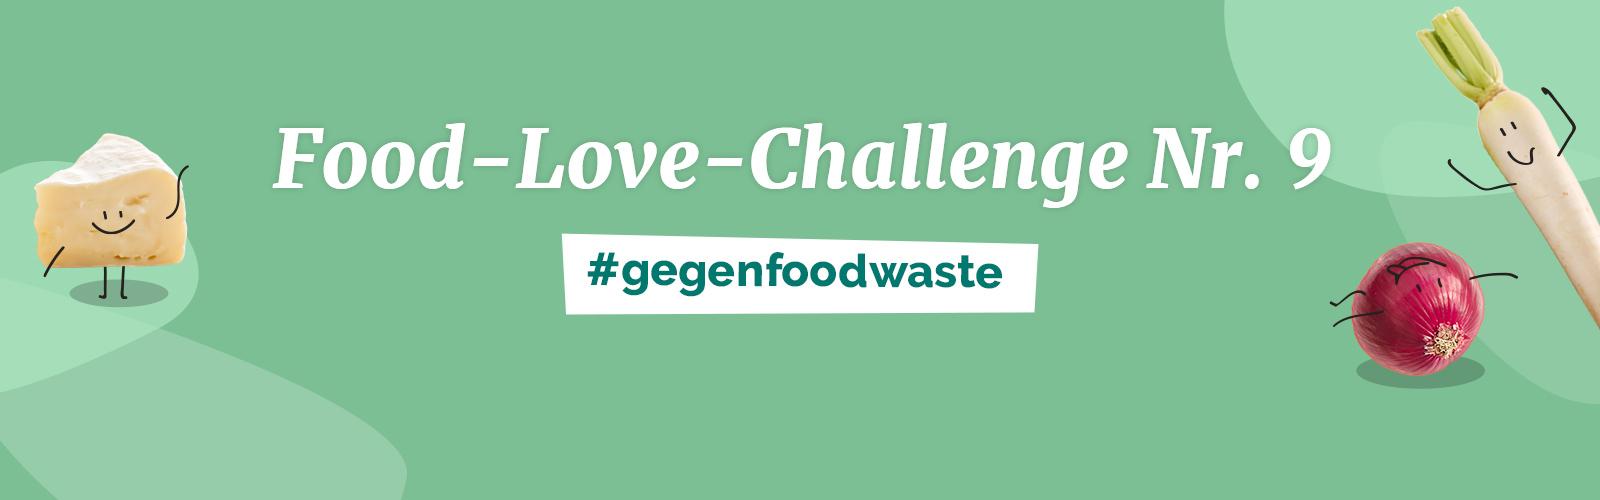 Food Love Challenge Nr. 9